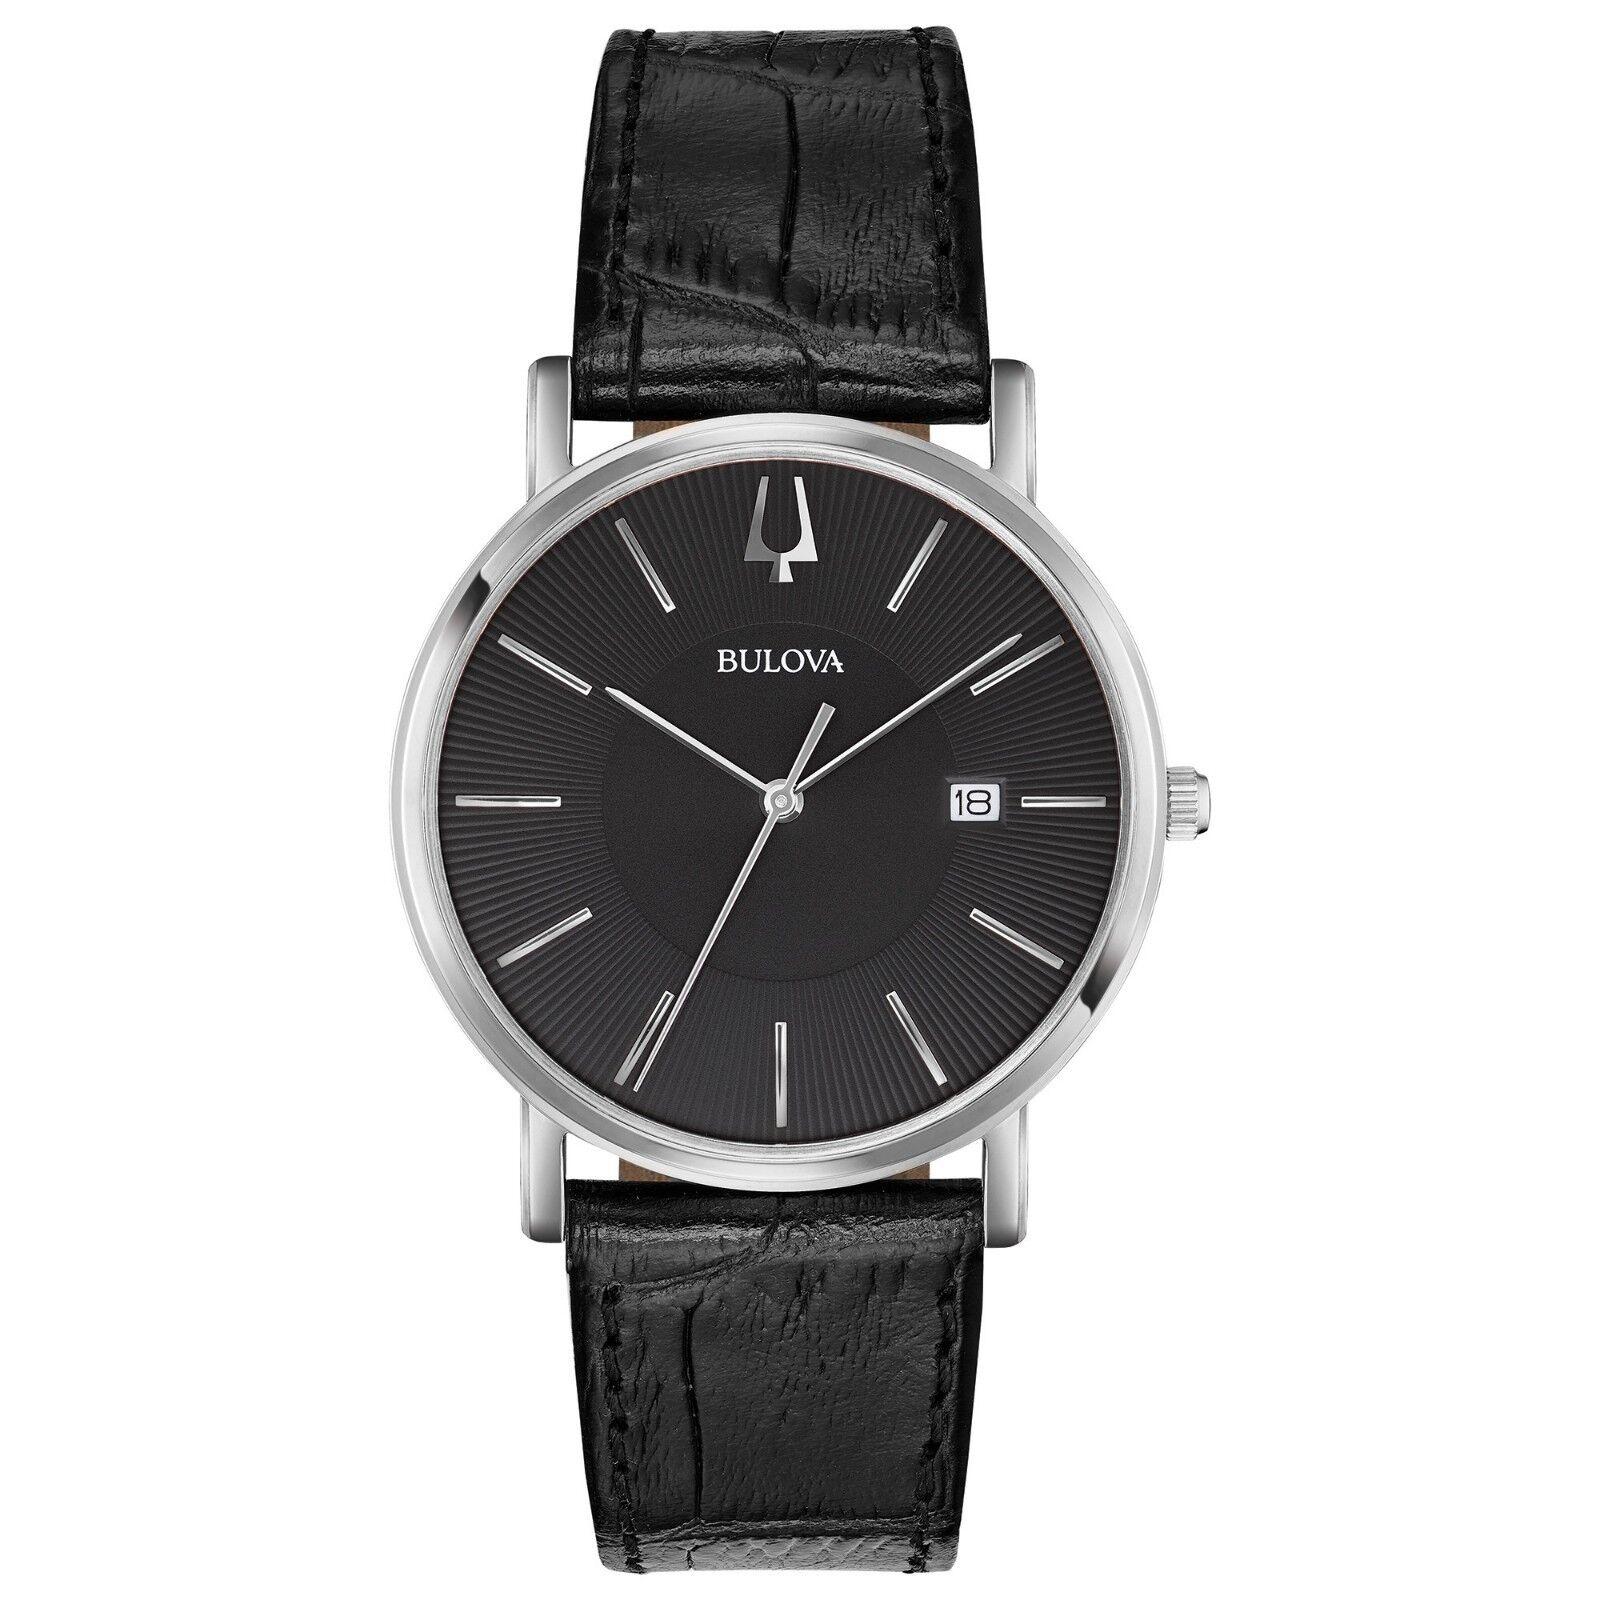 Bulova Classic Men's Quartz Silver Tone Black Leather Band 37mm Watch 96B283